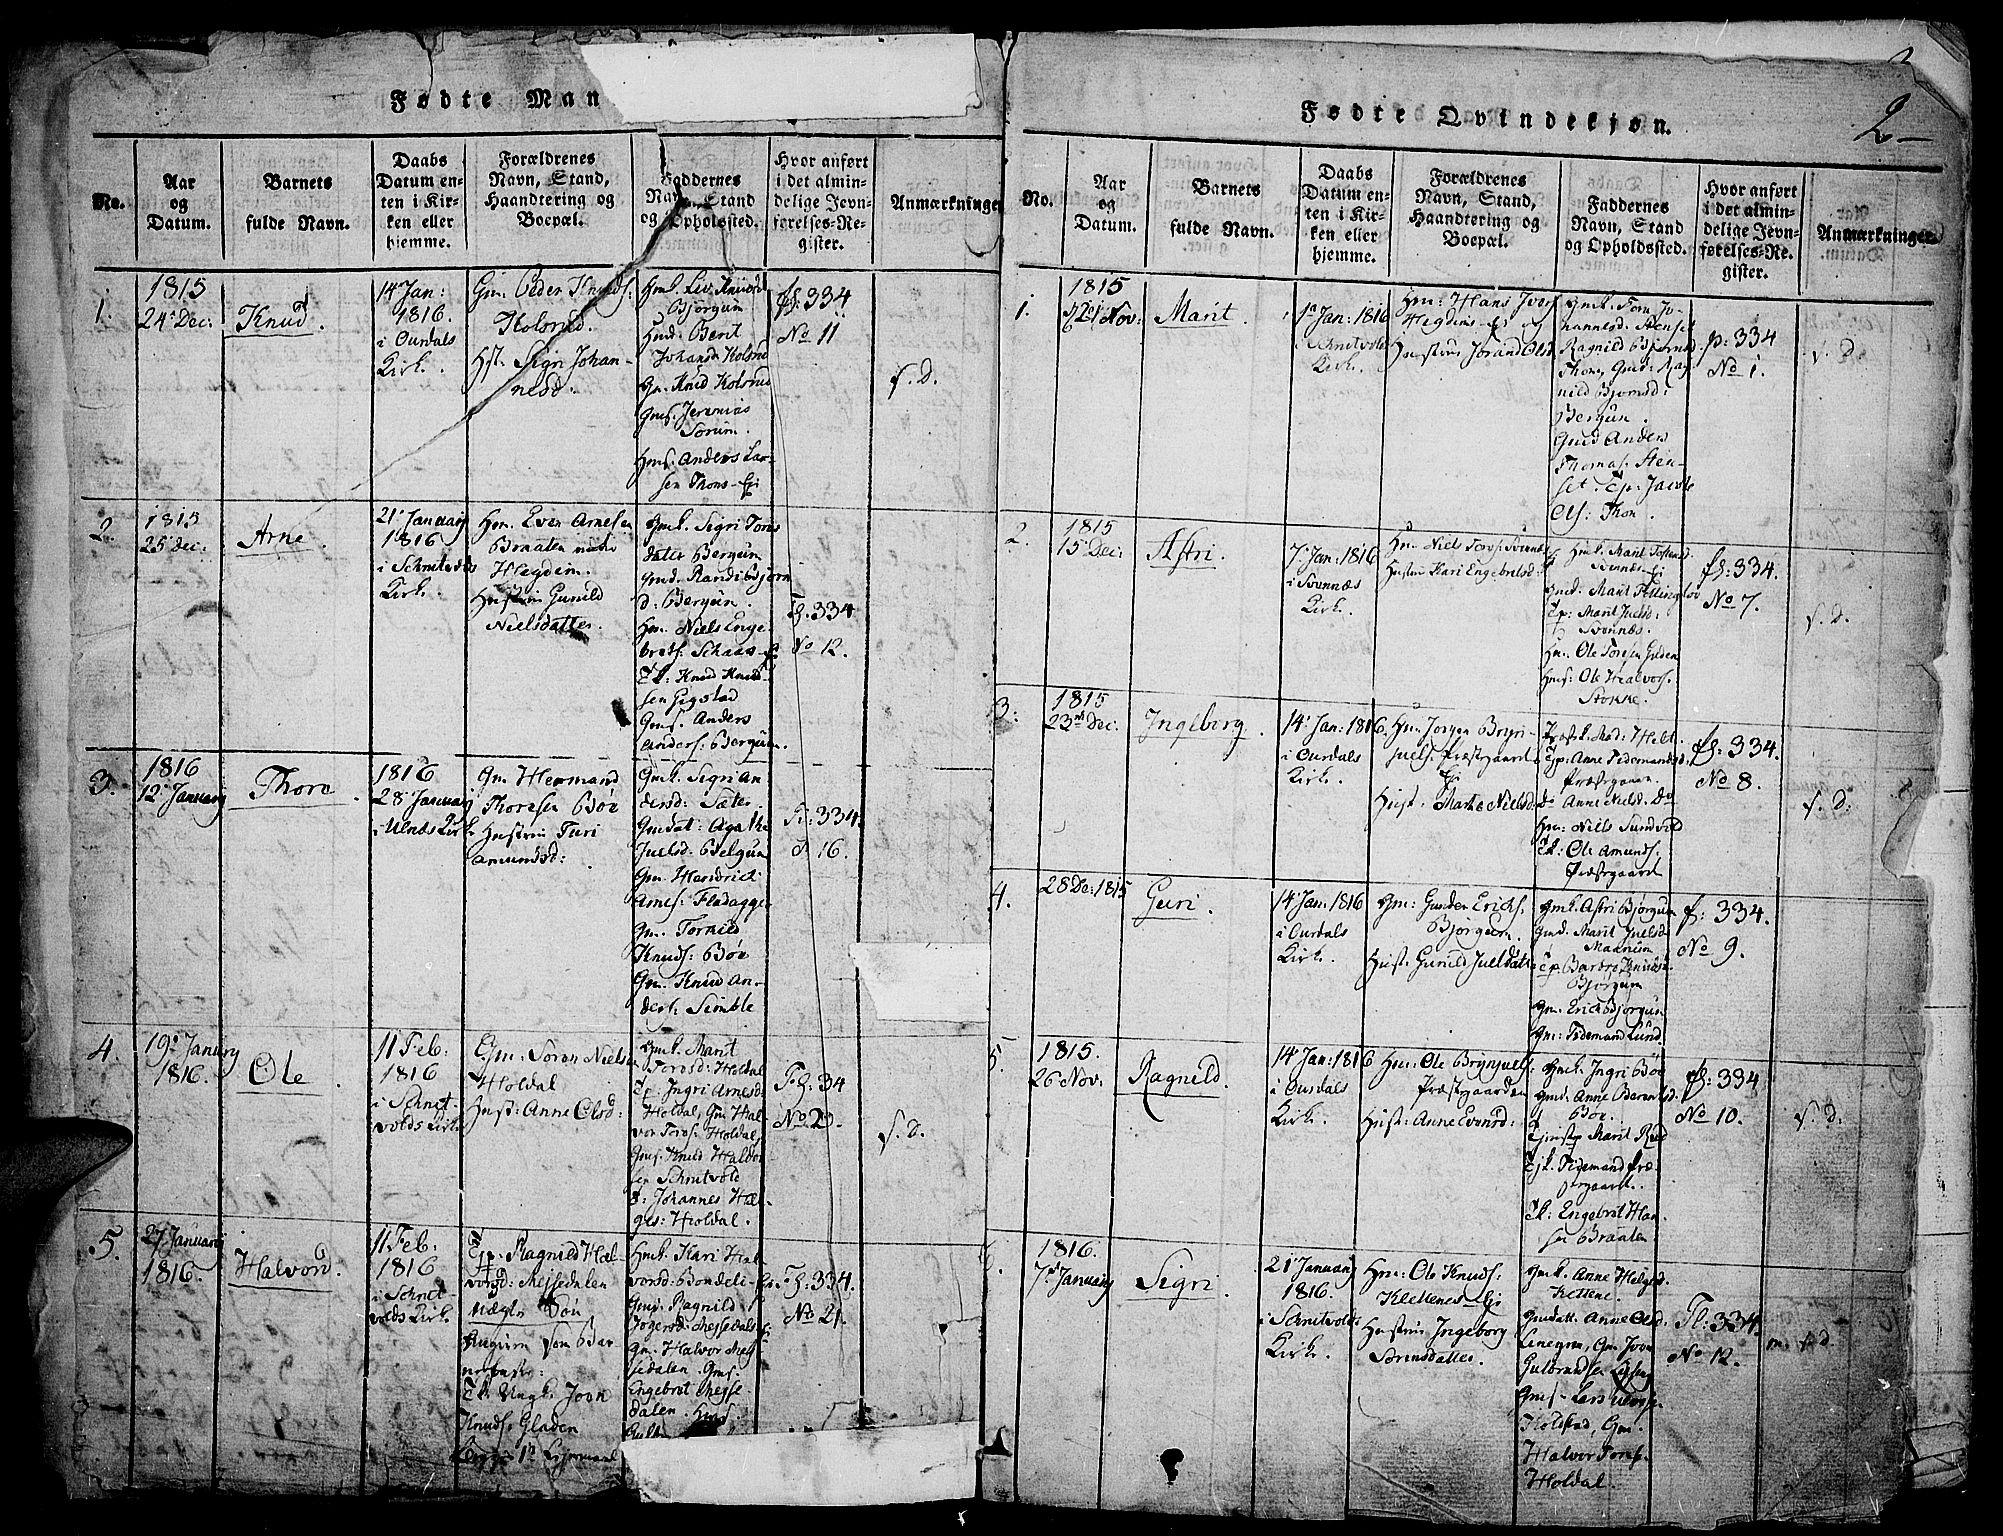 SAH, Nord-Aurdal prestekontor, Ministerialbok nr. 2, 1816-1828, s. 2